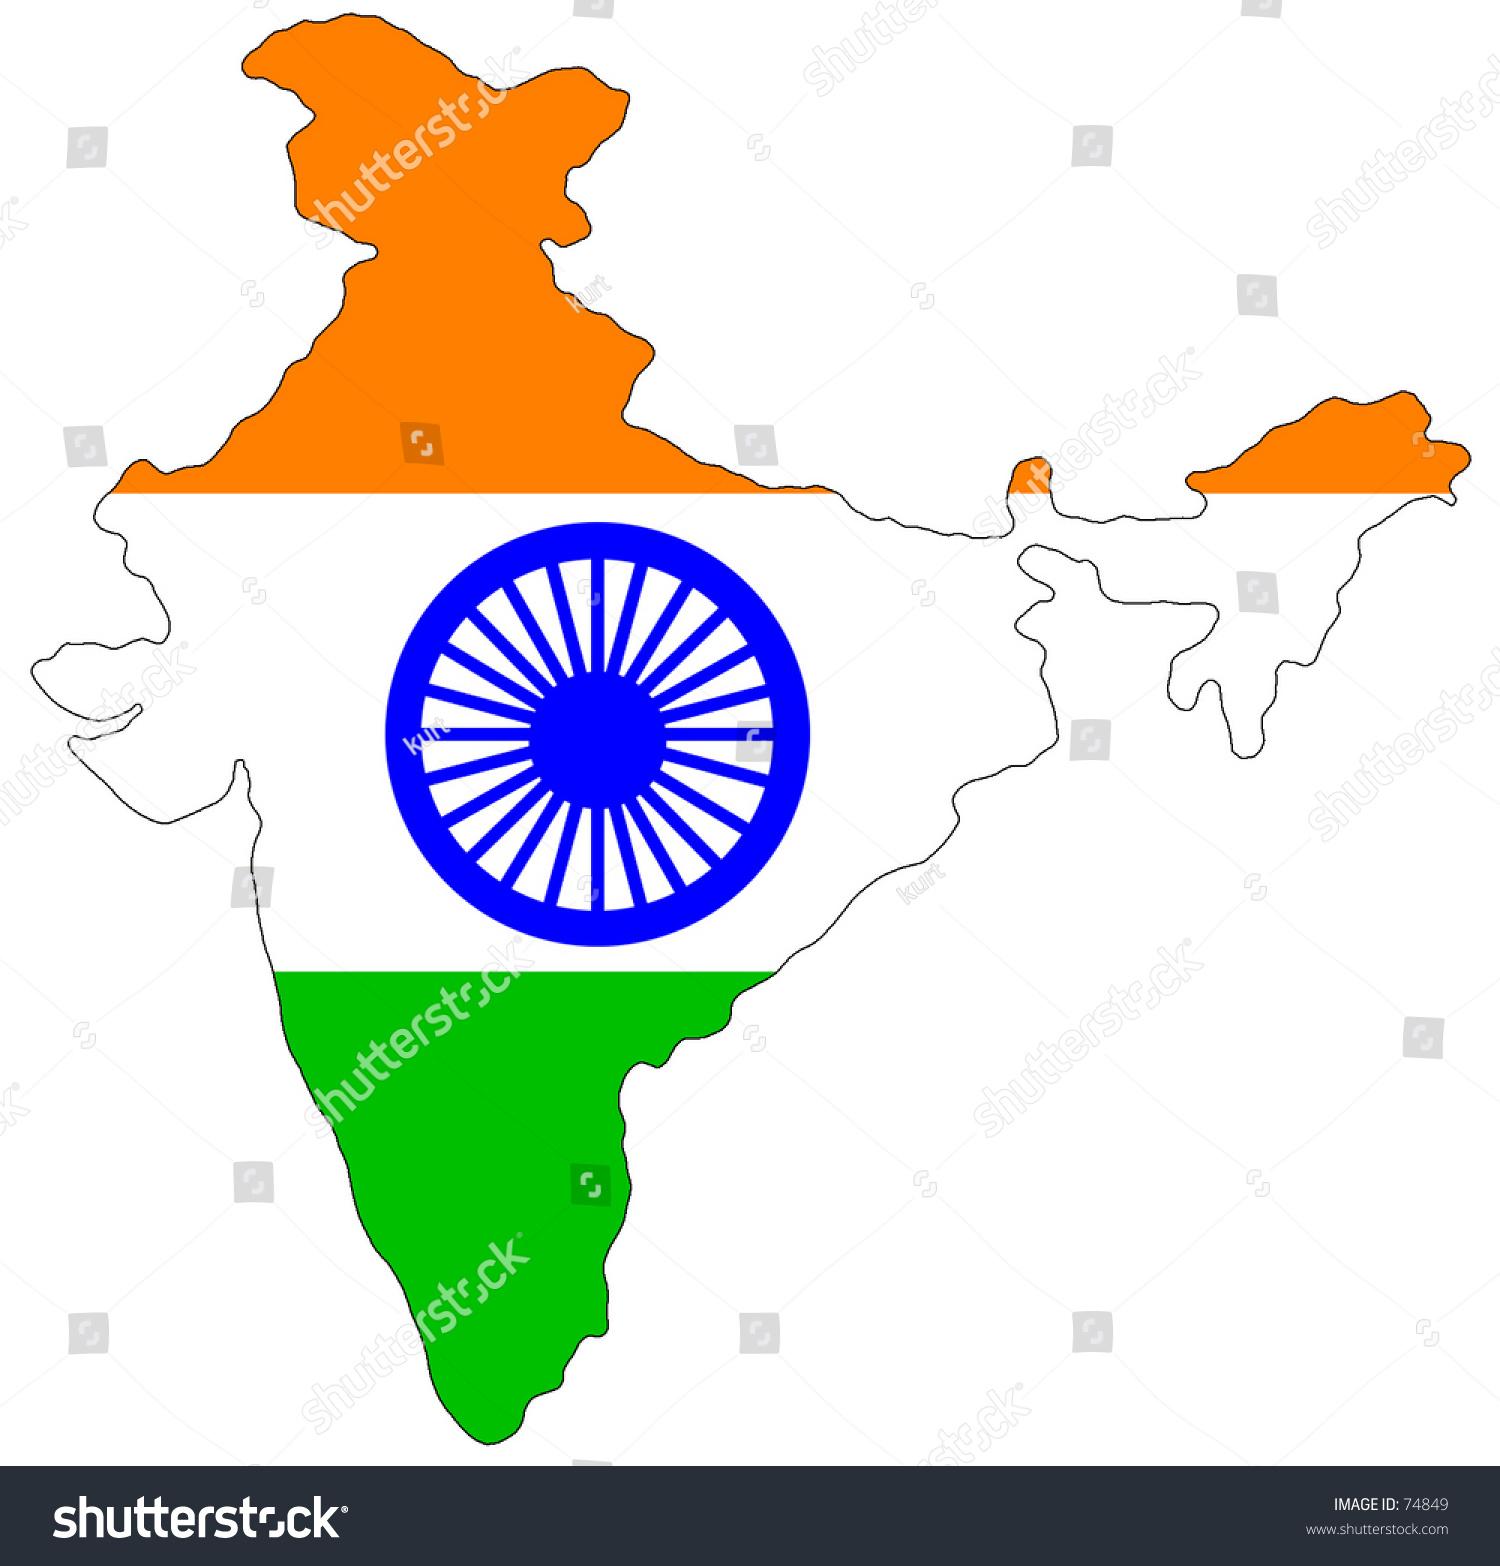 Plain Map Of India.Map India Filled Plain Indian Flag Stock Illustration 74849